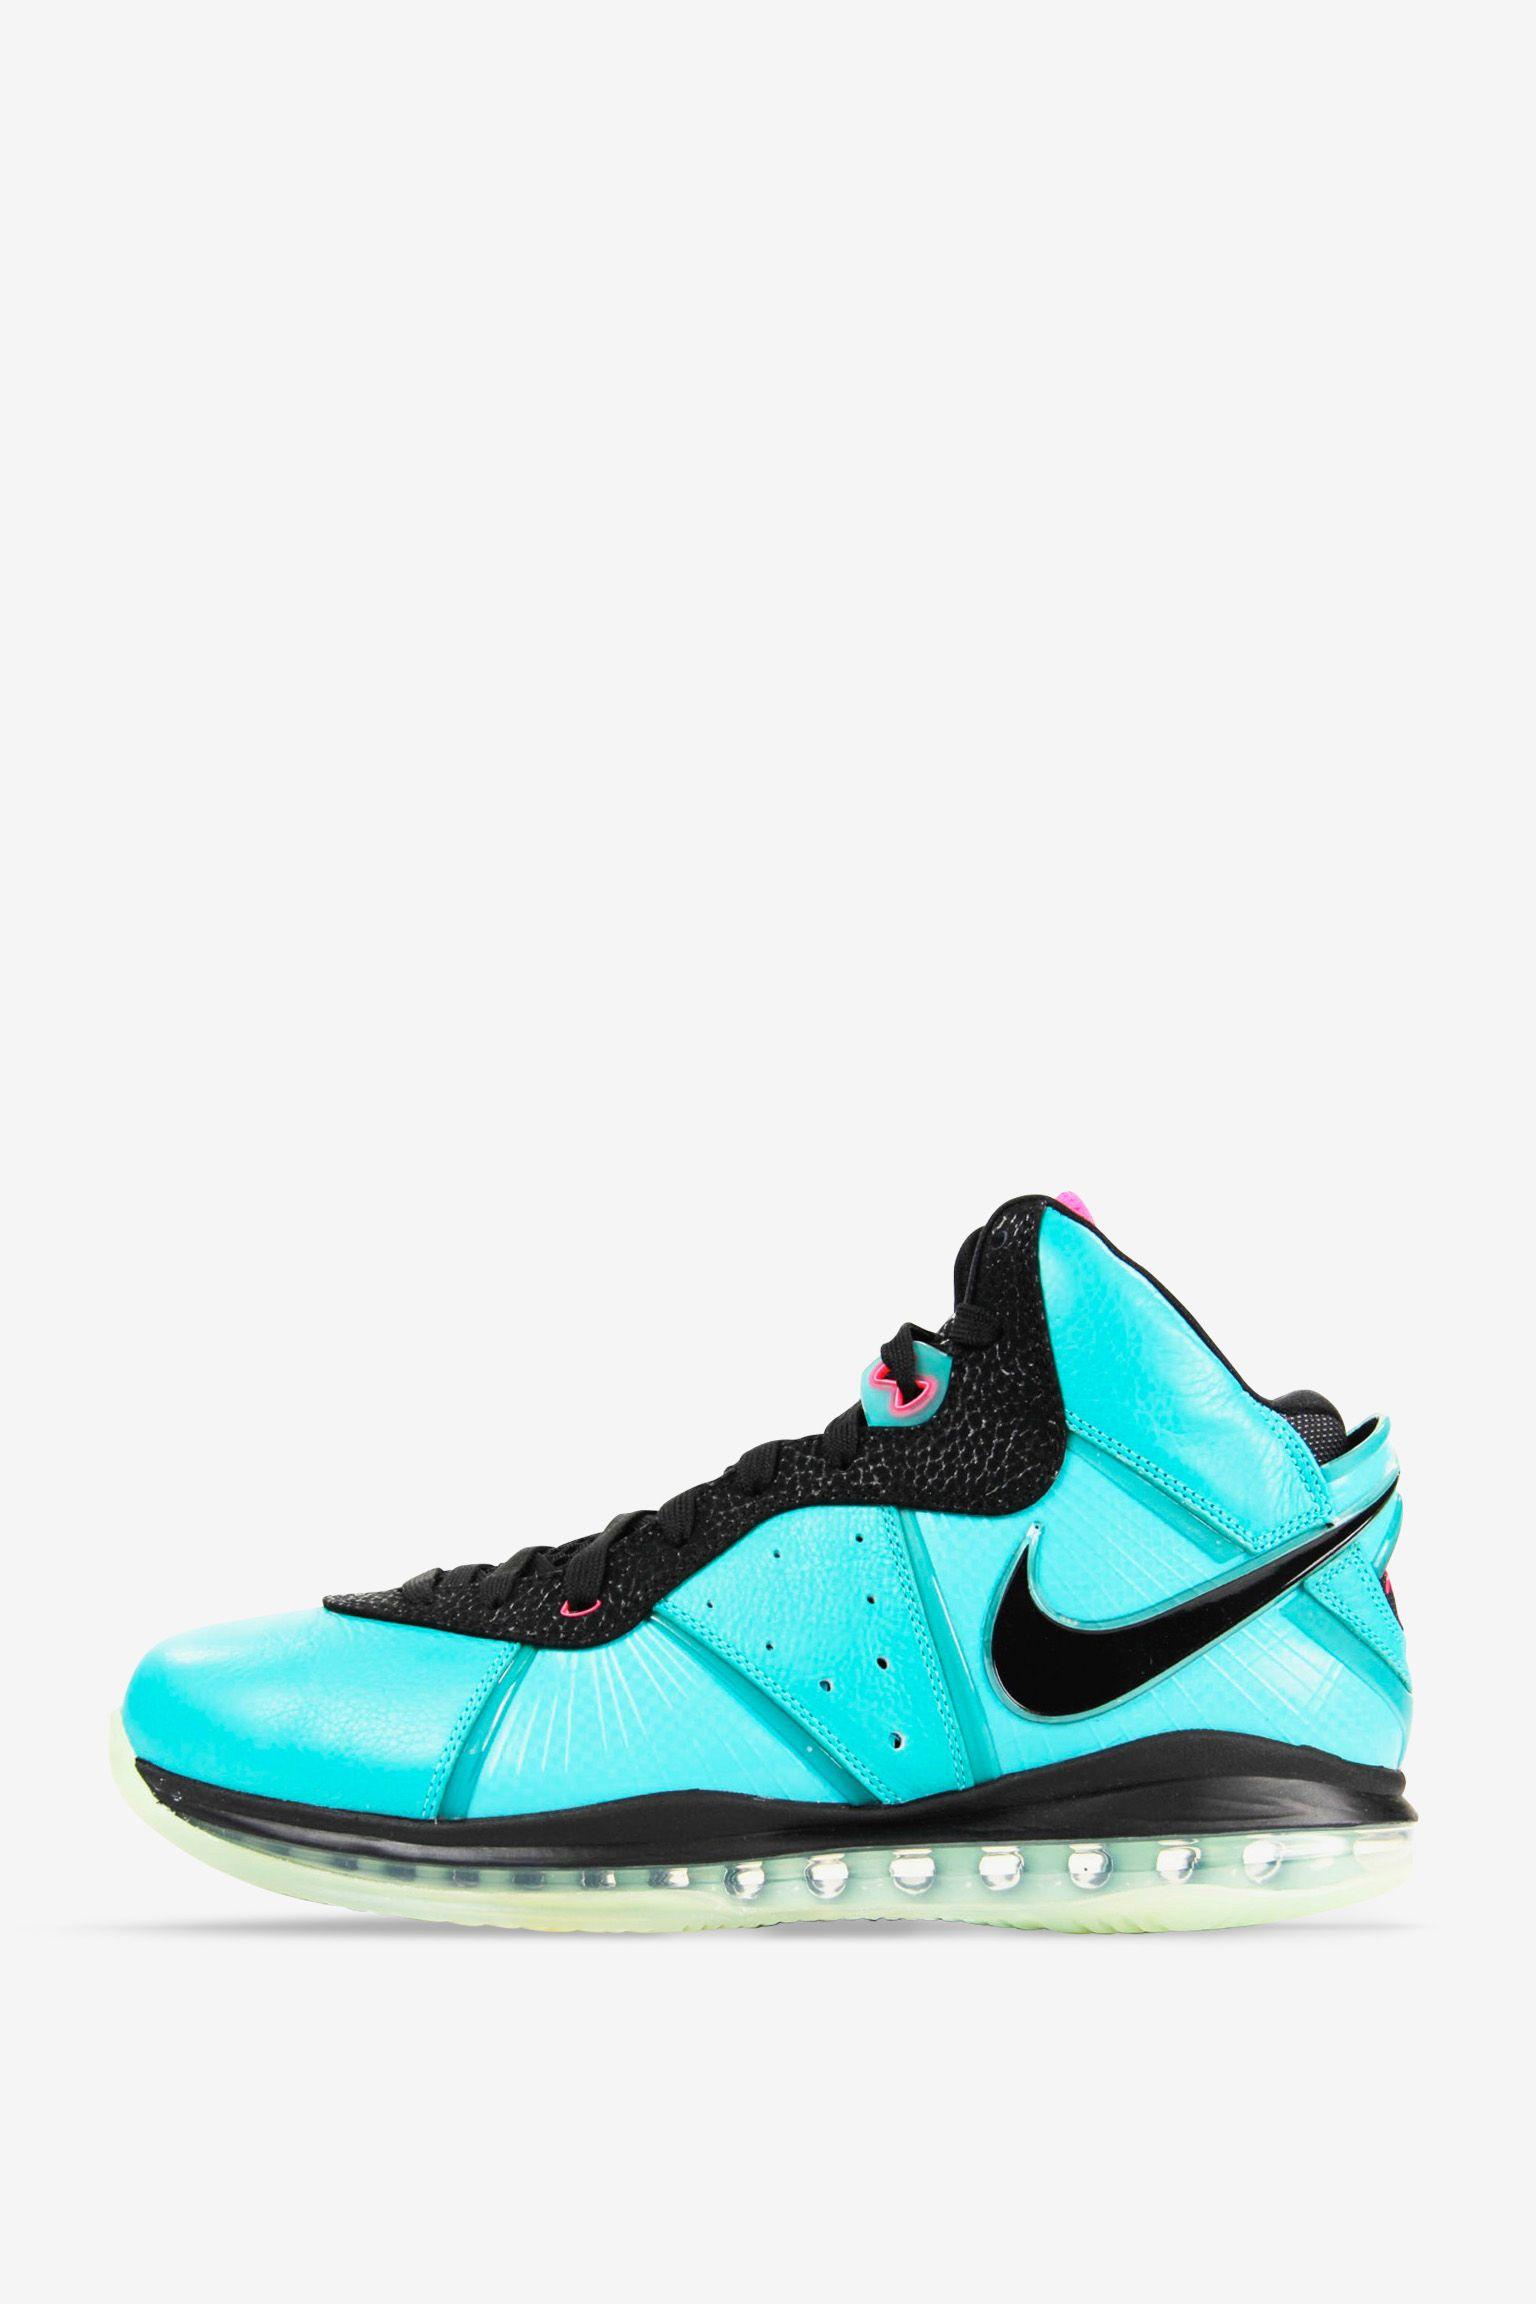 Nike Lebron Watch 'Lebron 15 South Beach'